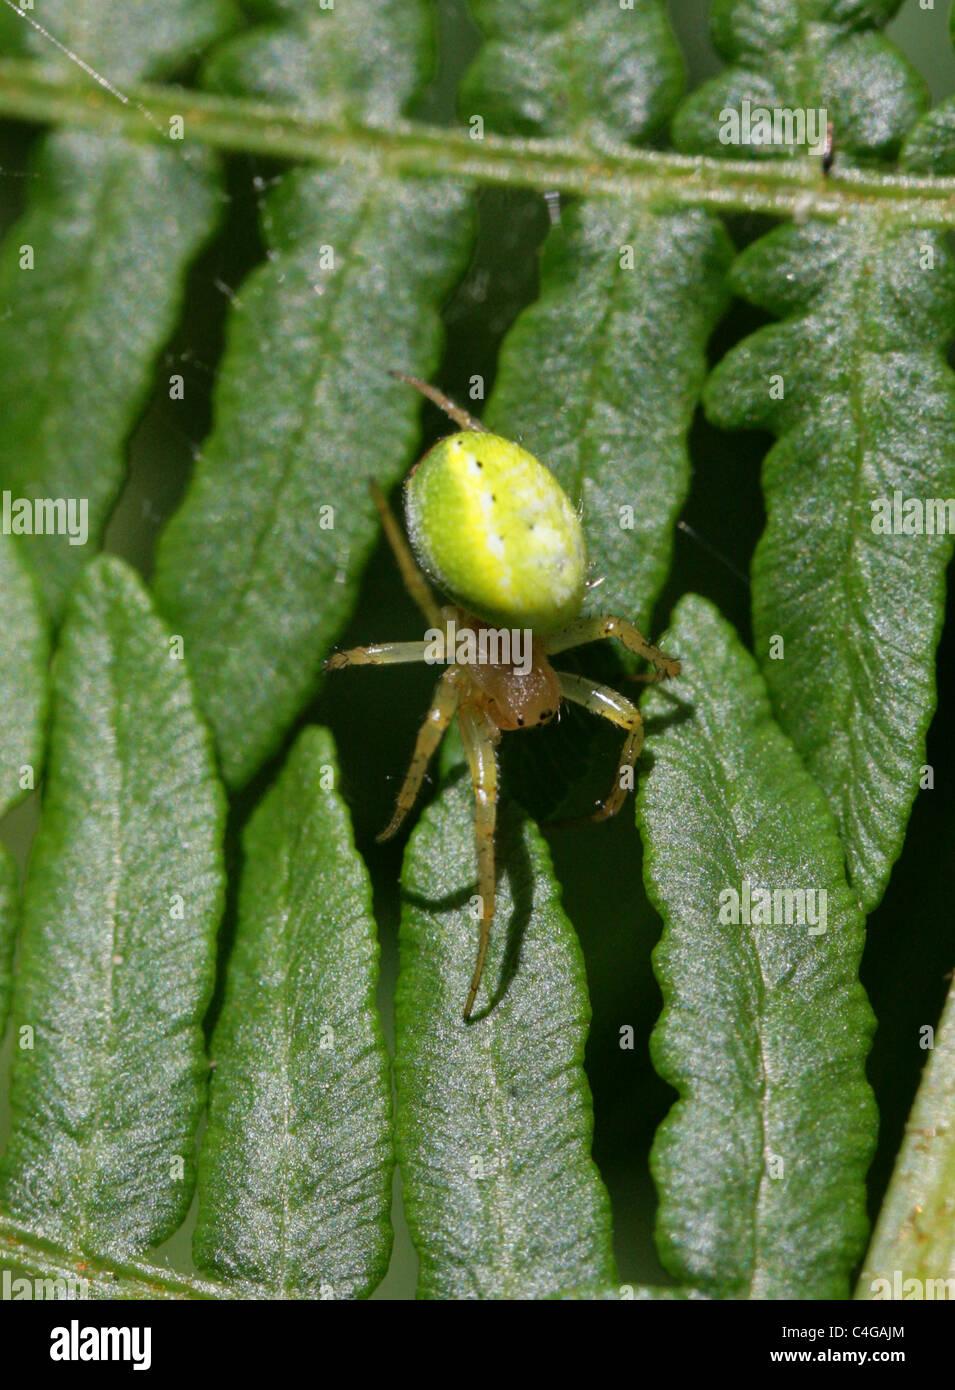 Cucumber Green Spider or Green Orb Weaver Spider, Araniella cucurbitina, Araneidae. Aka Gourd or Pumpkin Spider. - Stock Image